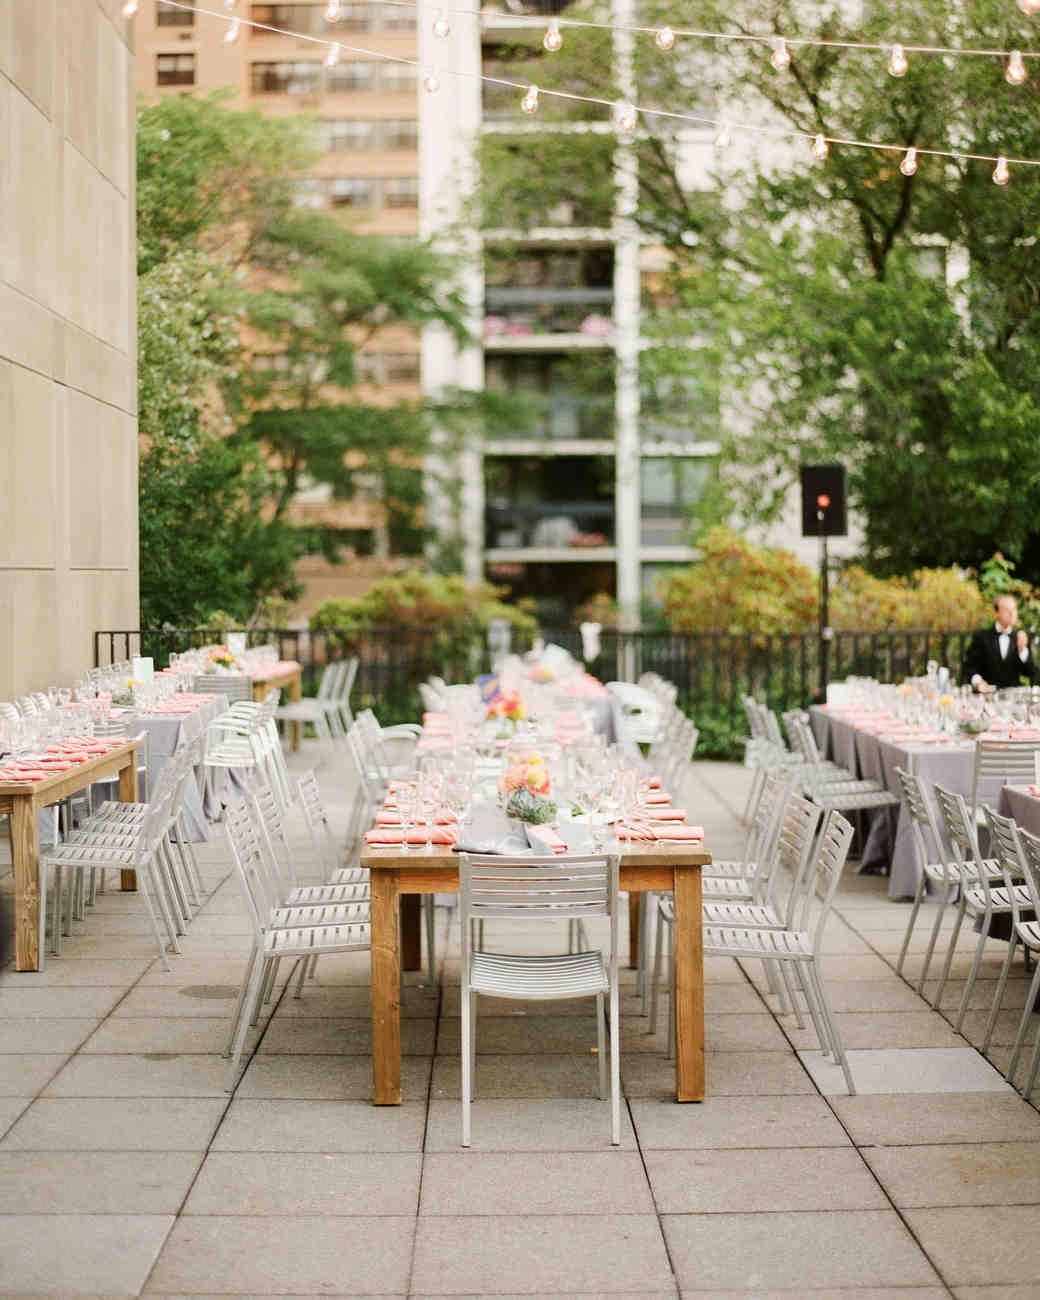 christina-jimmy-wedding-reception-8054.jpg